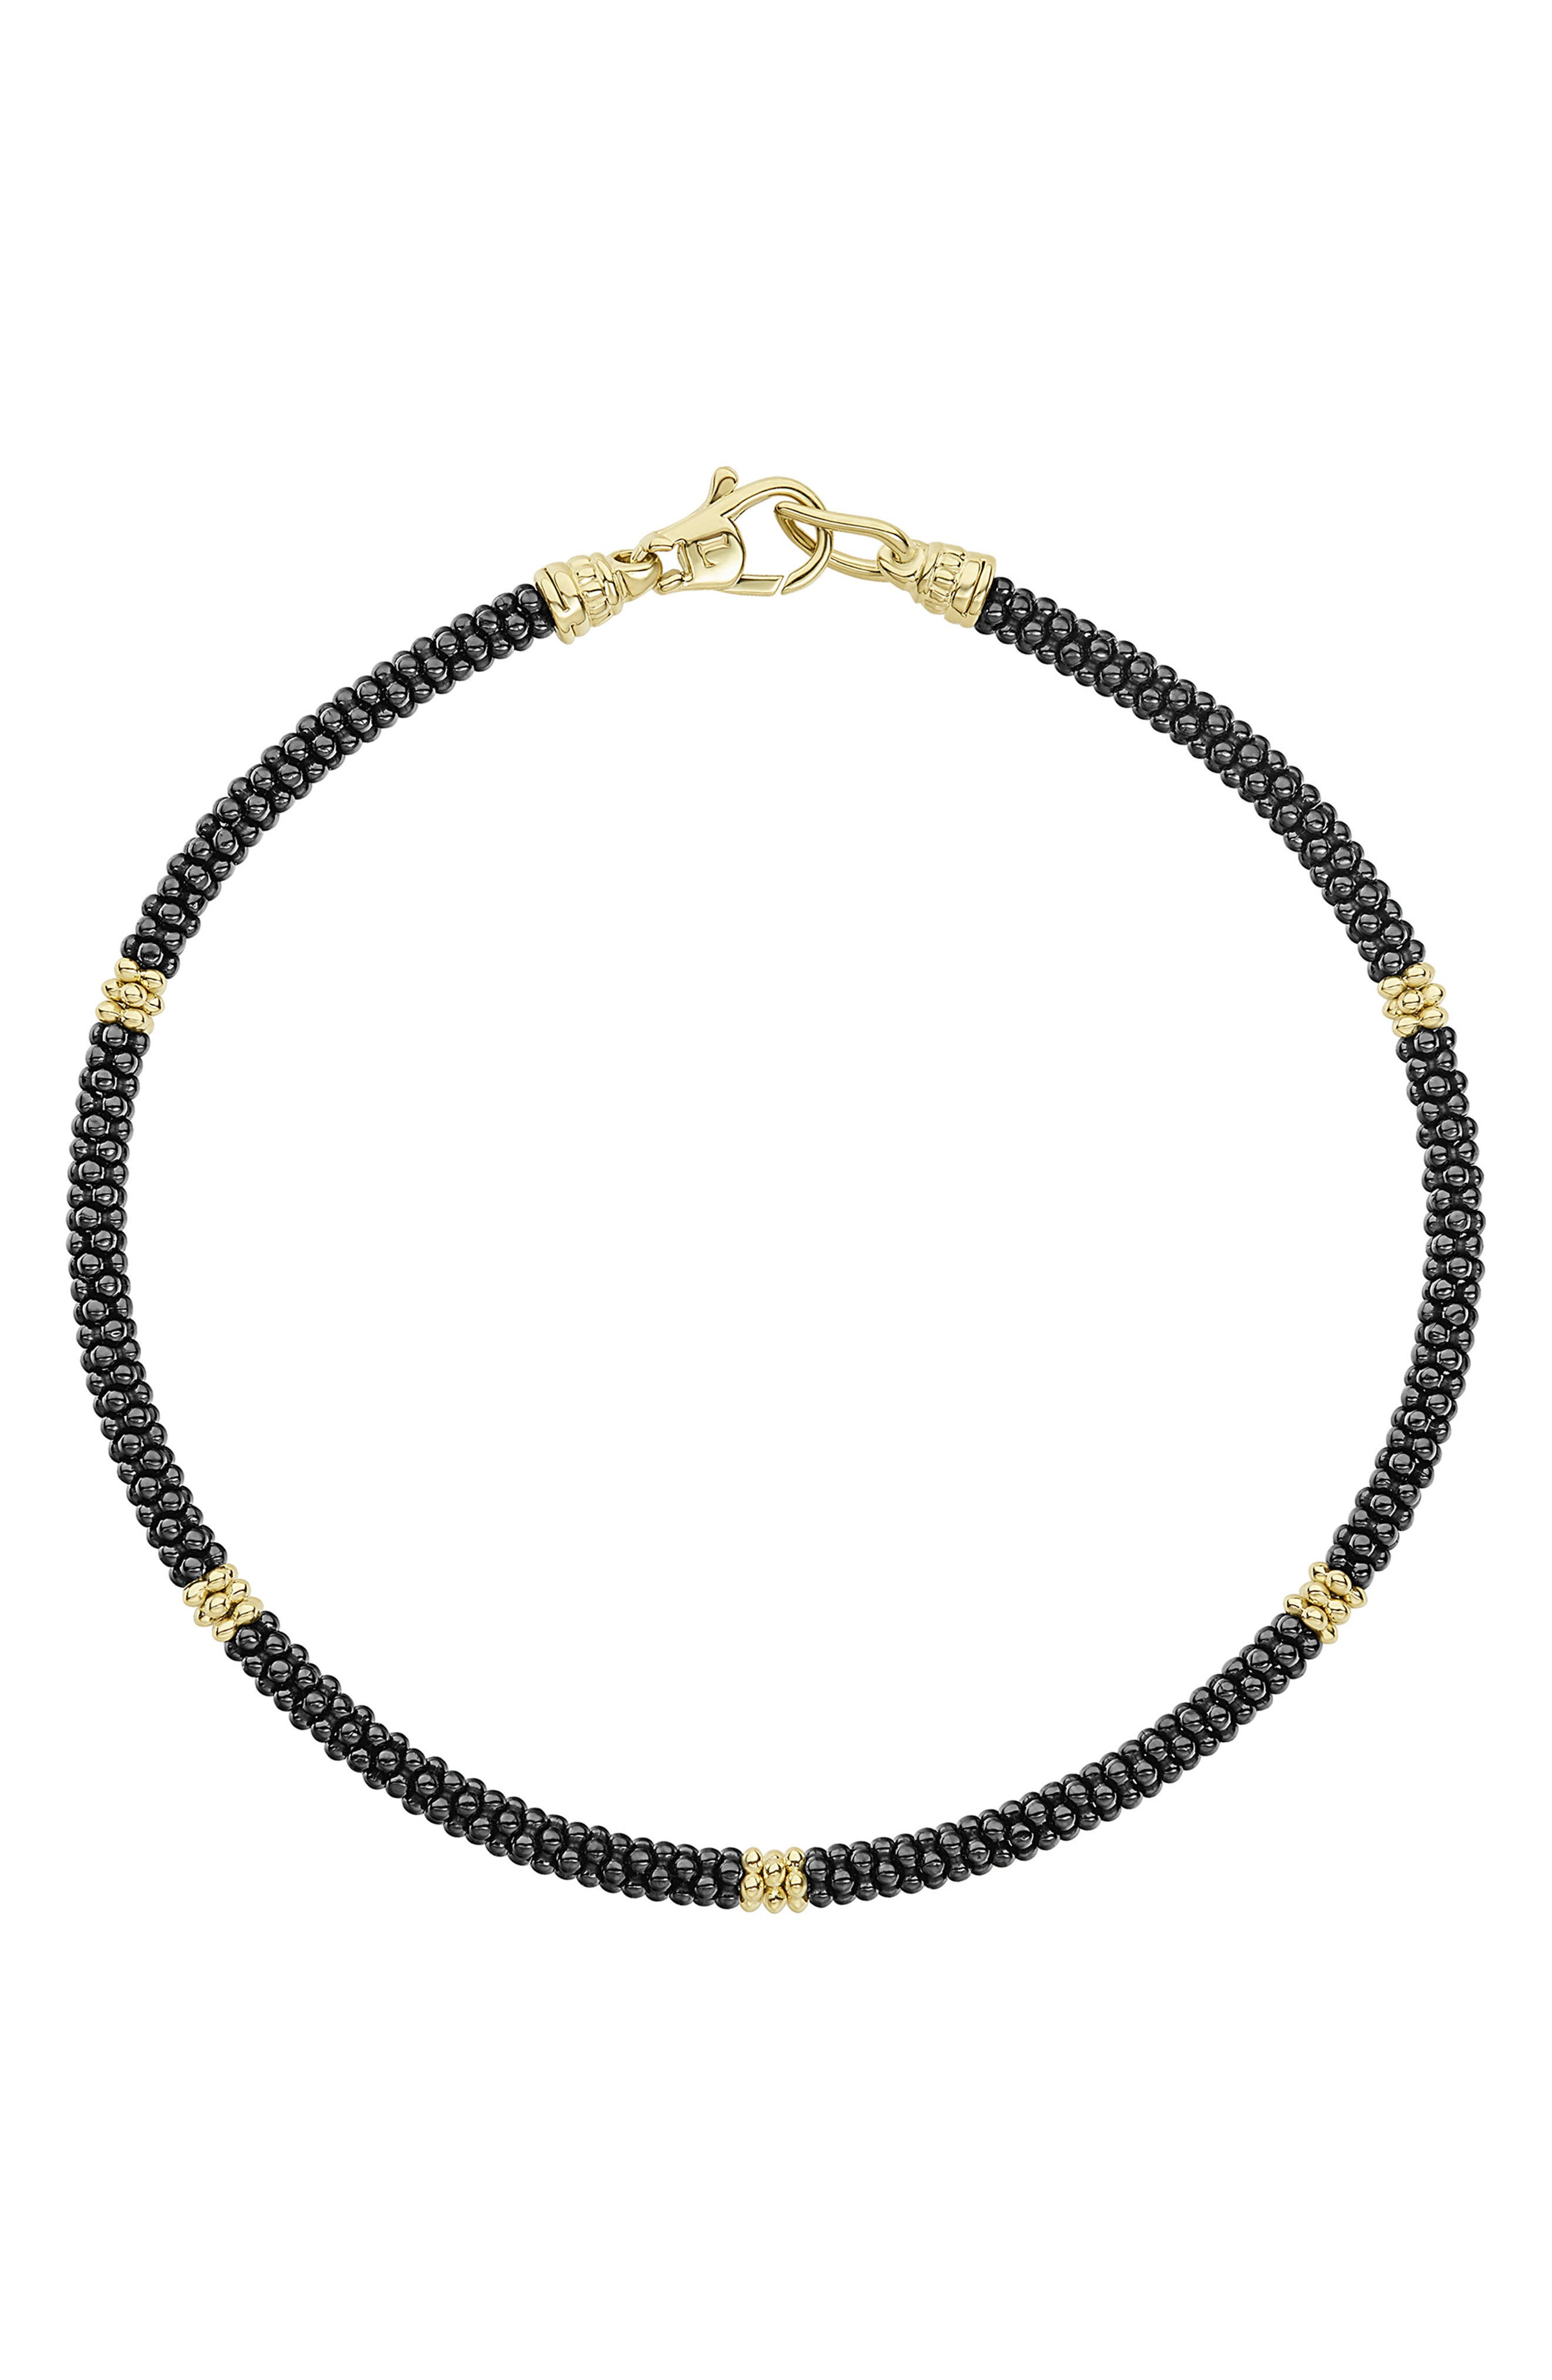 Gold & Black Caviar Rope Bracelet,                         Main,                         color, Gold